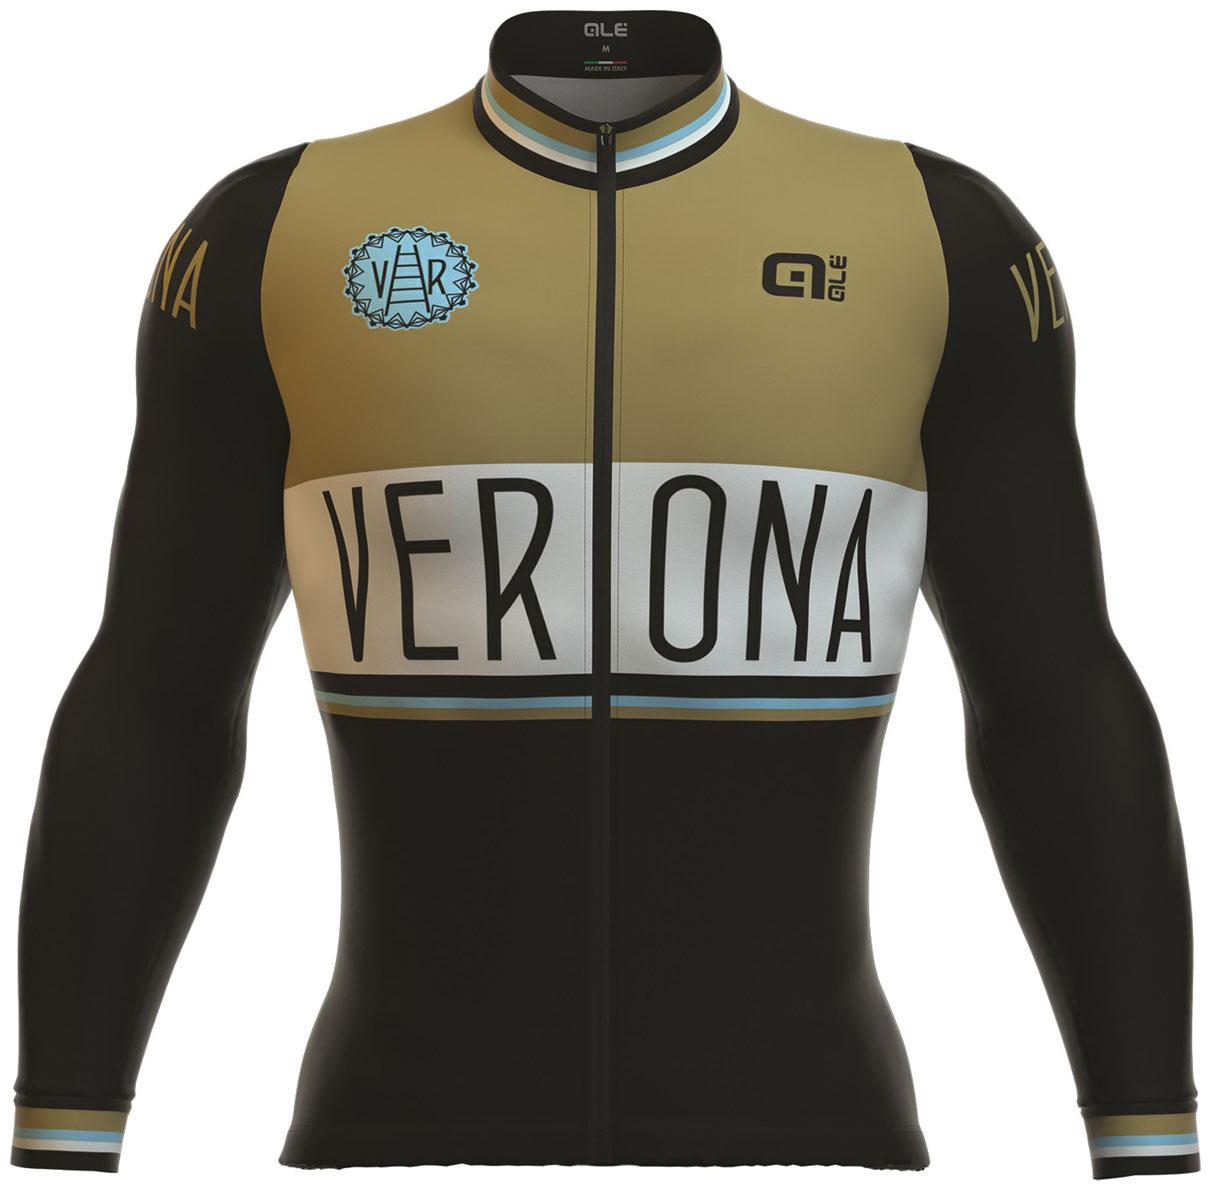 Al men 39 s classic verona long sleeve jersey black for Uniform verona